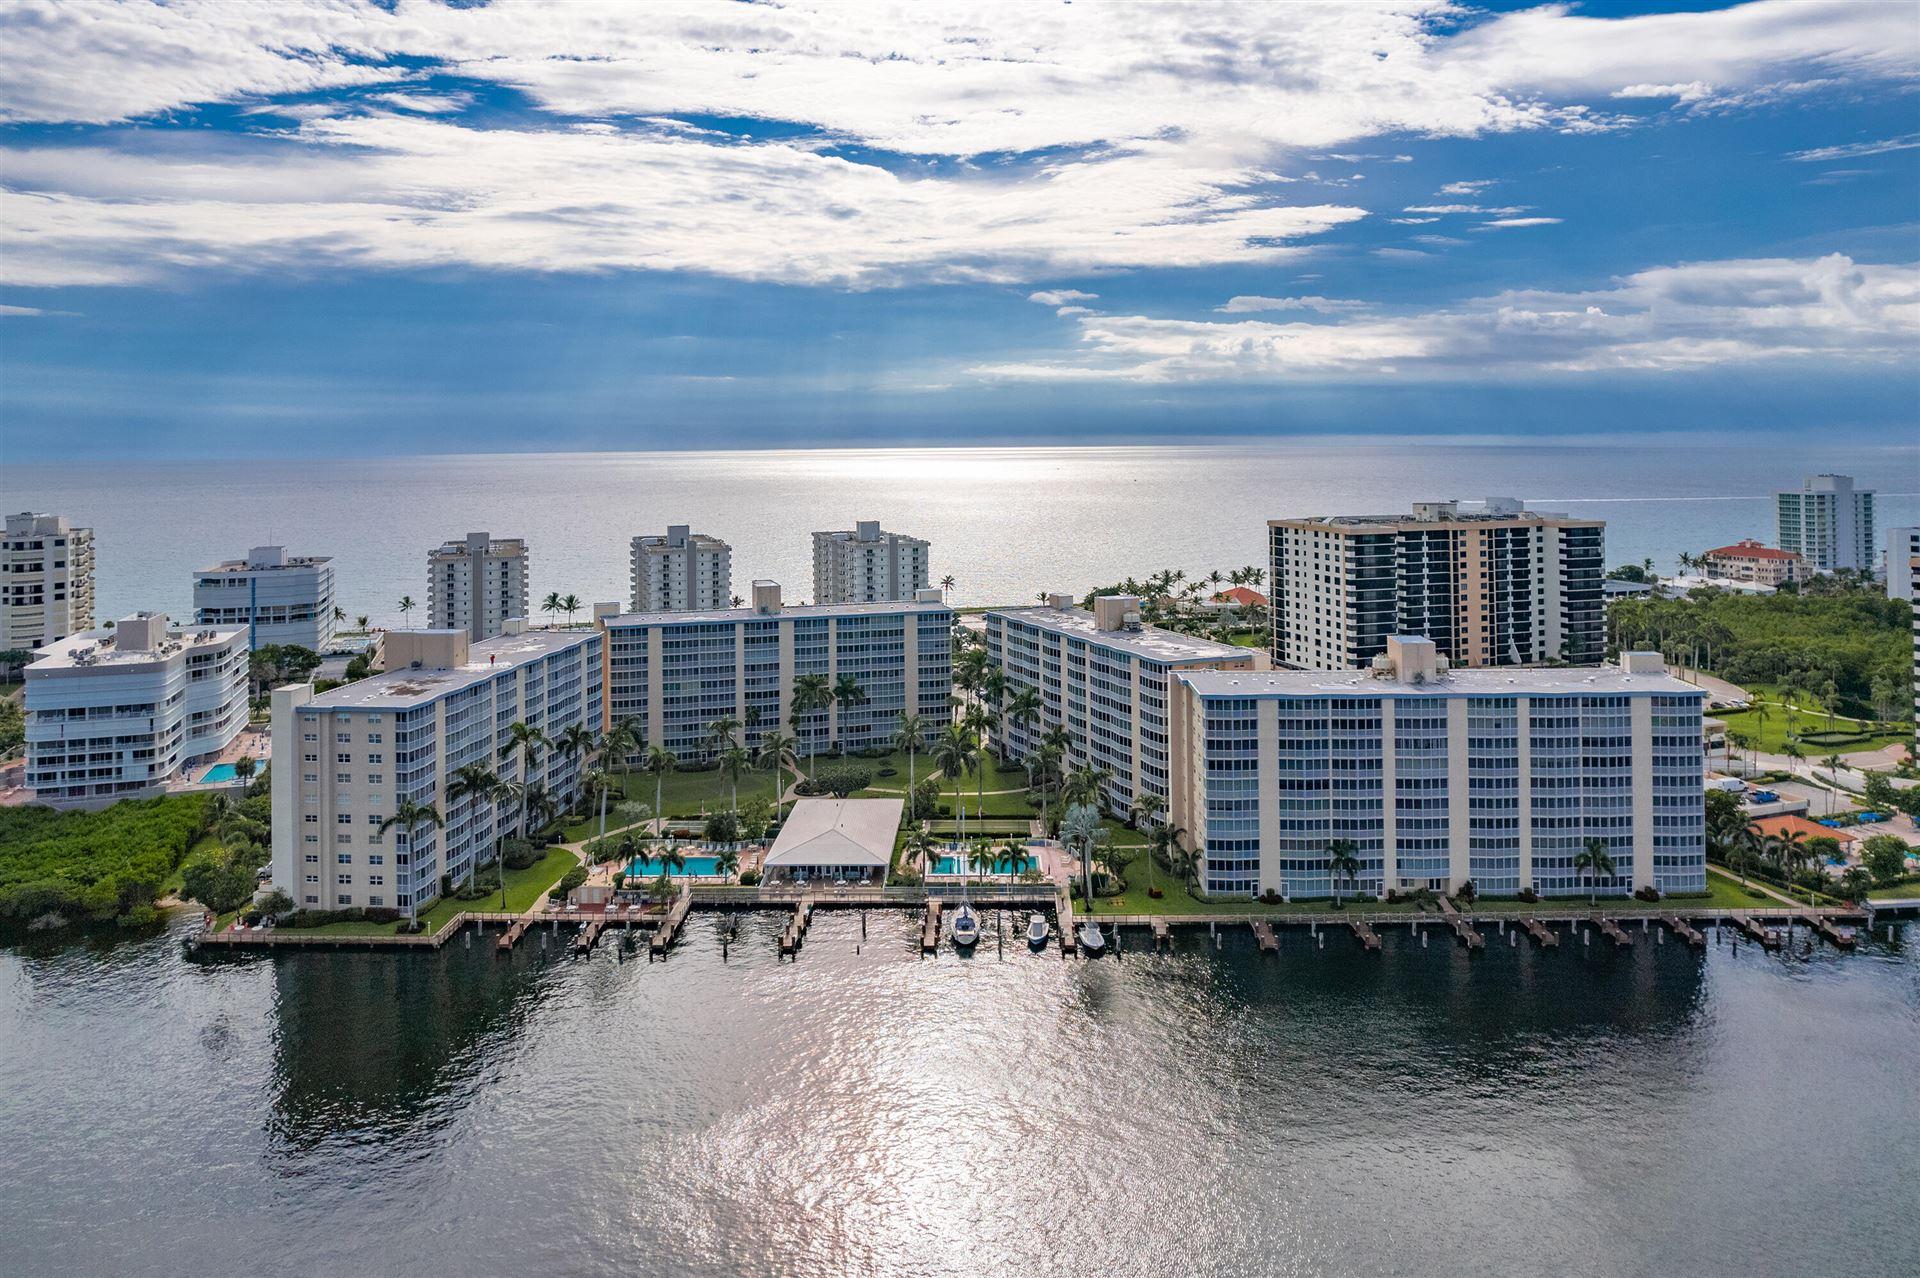 3300 S Ocean Boulevard #317 C, Highland Beach, FL 33487 - #: RX-10747519